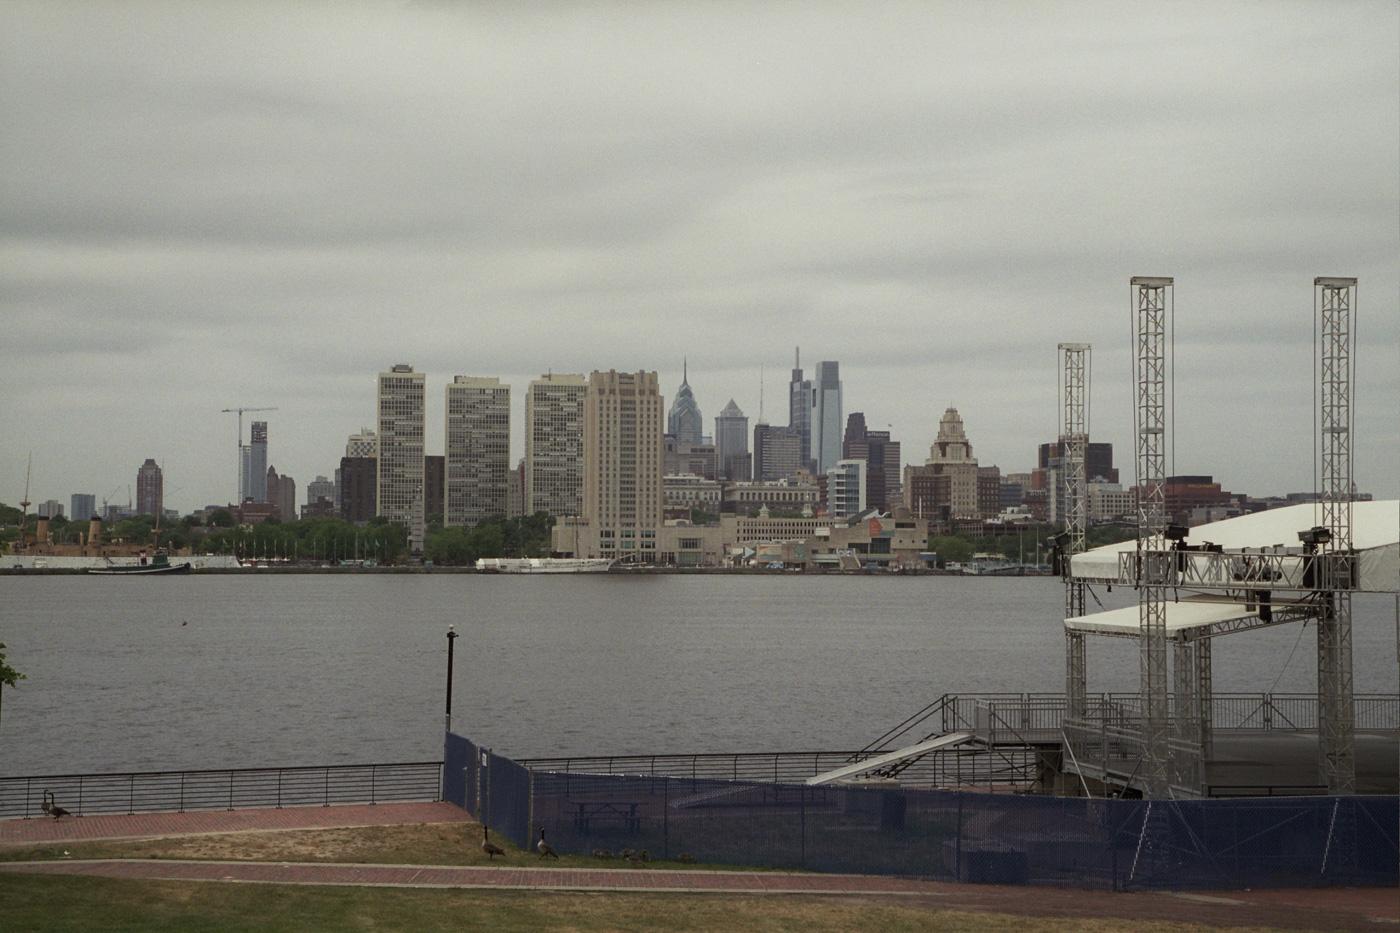 Philadelphia Skyline from the Camden Waterfront